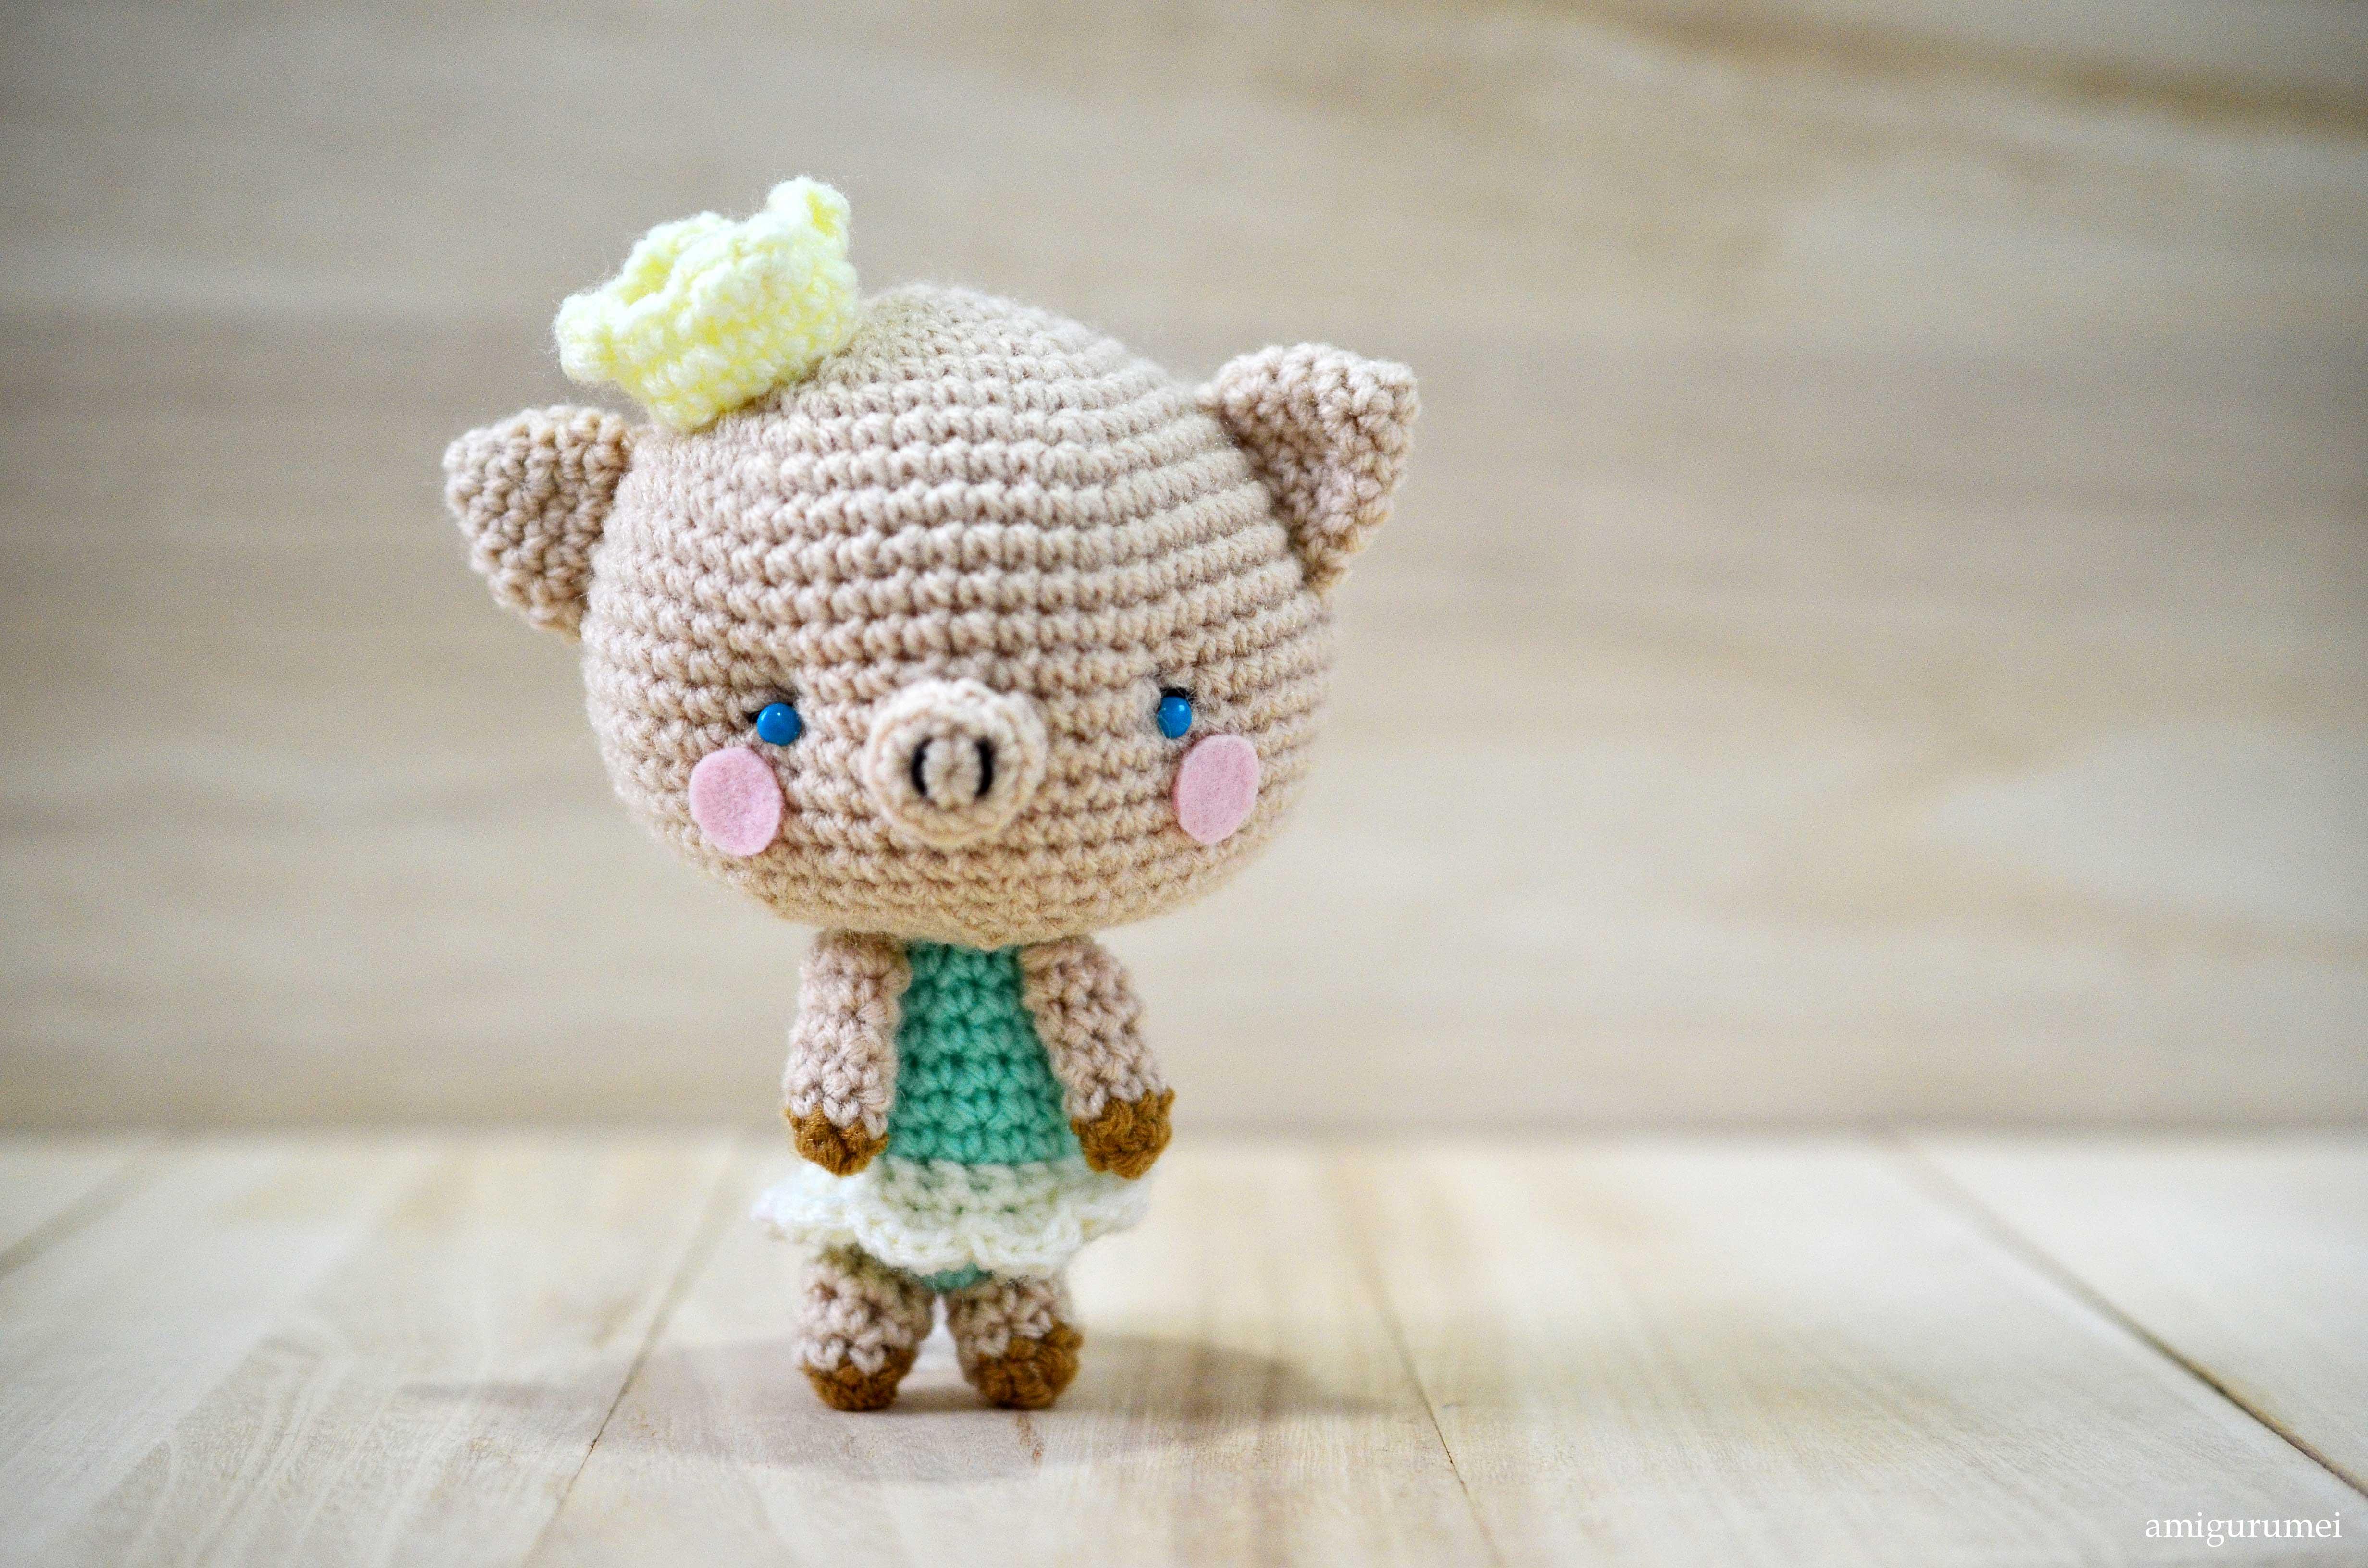 Amigurumi Pig : Free amigurumi pattern princess p amigurumei あみぐるメイ